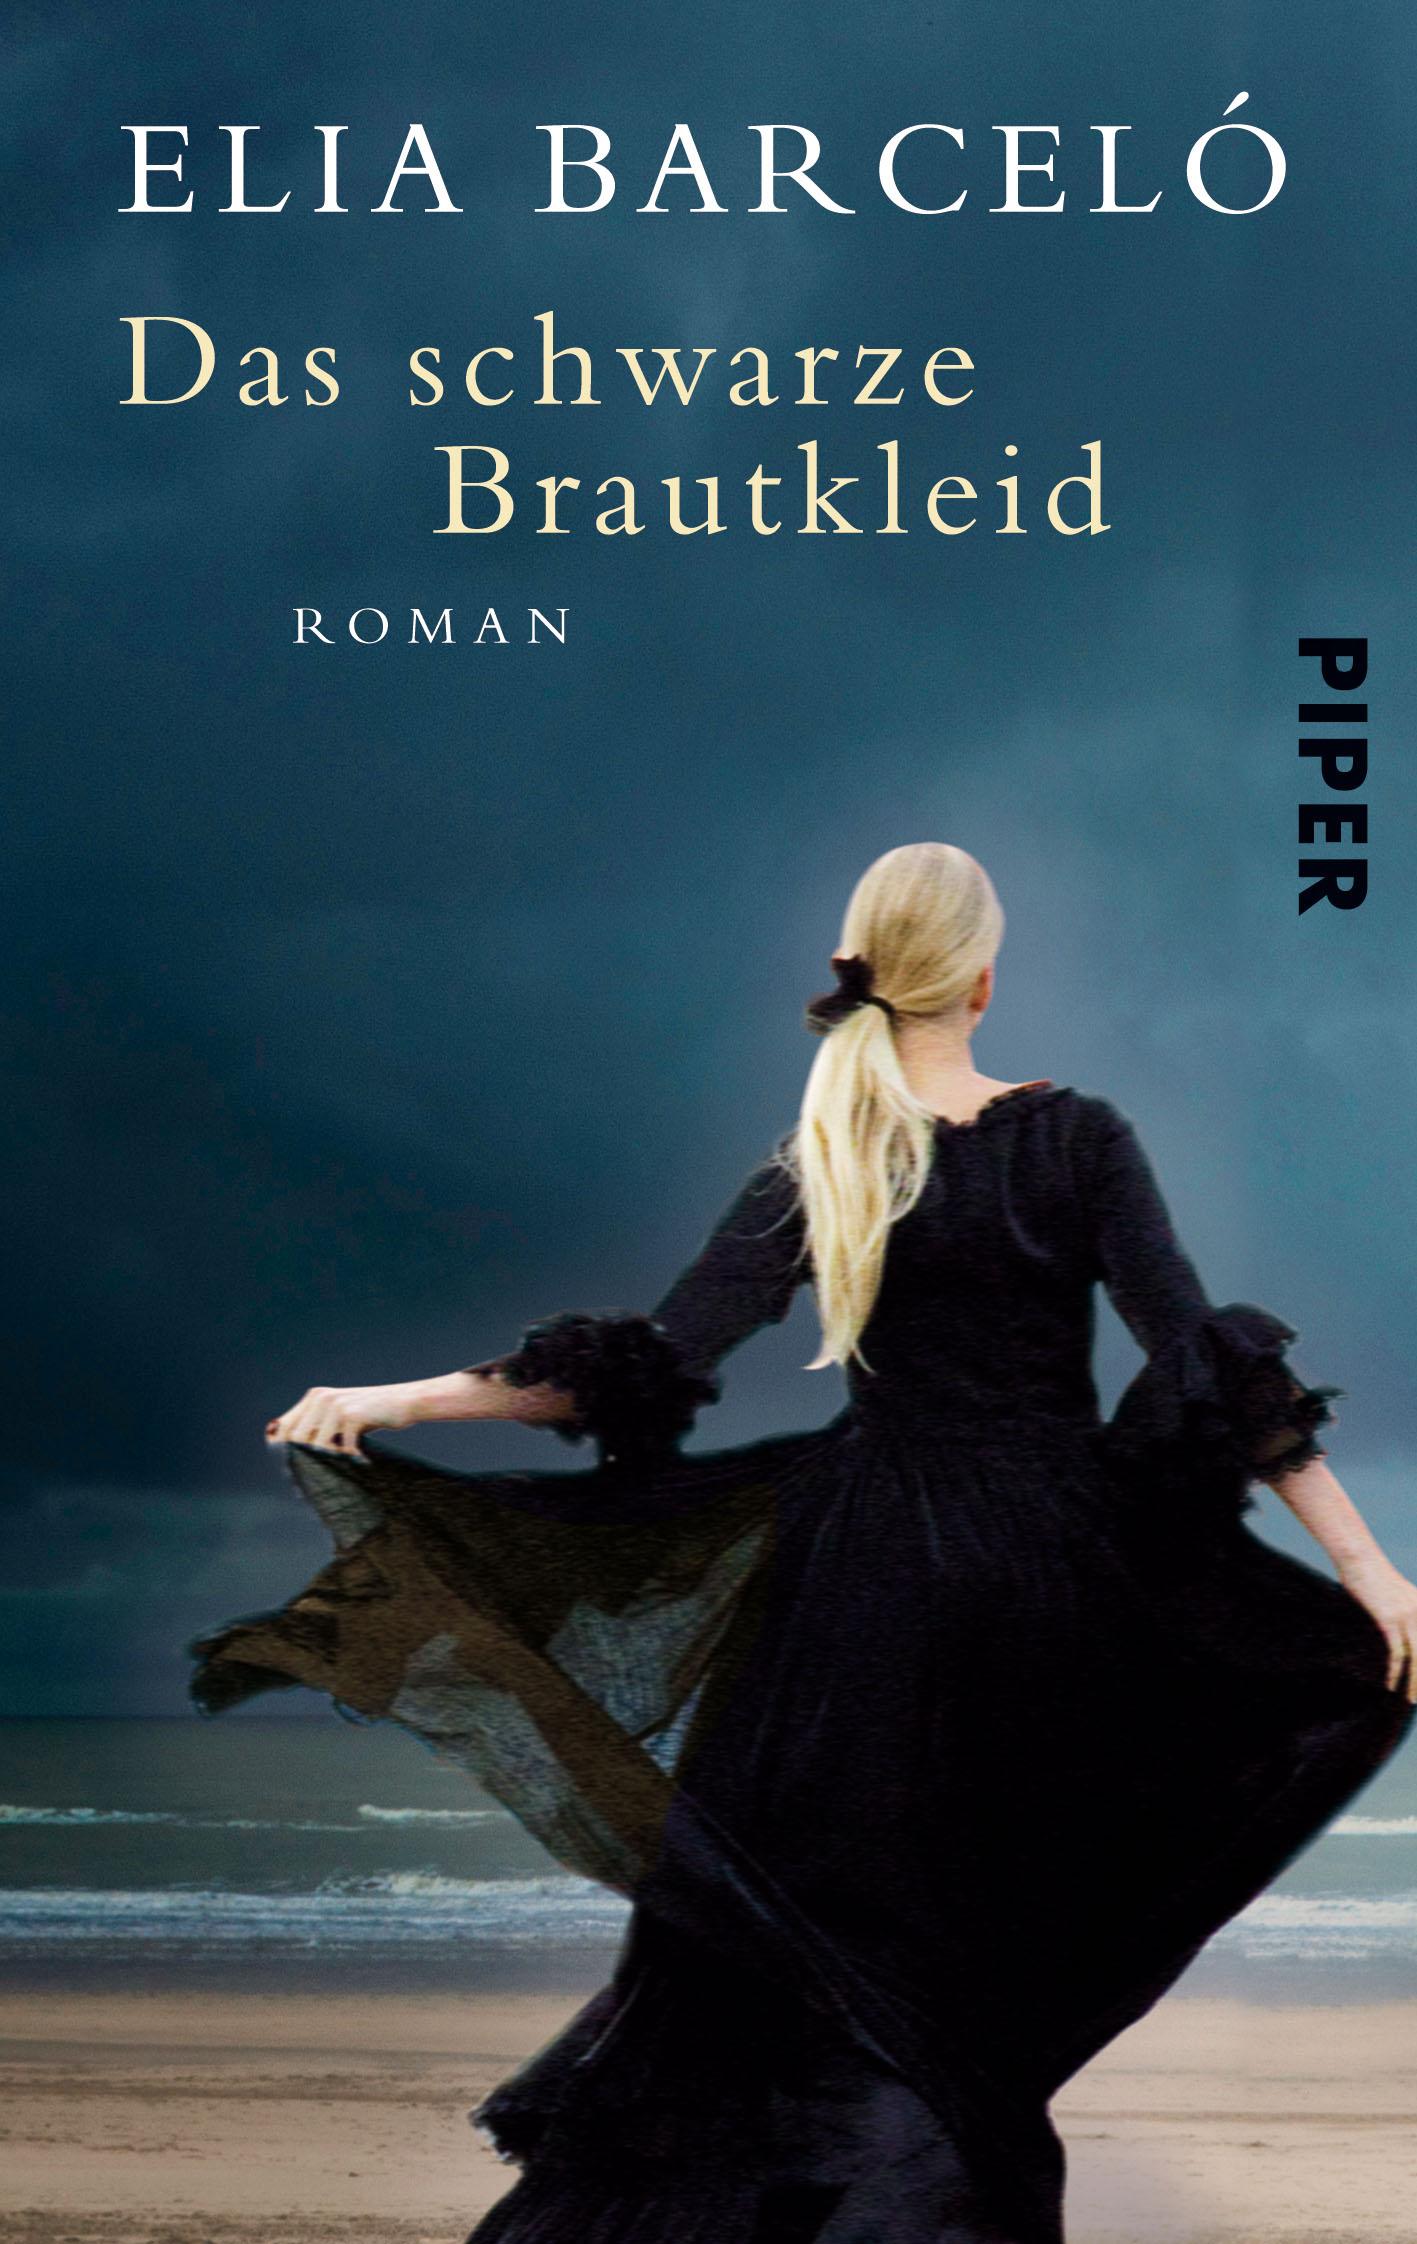 Das schwarze Brautkleid: Roman - Elia Barceló